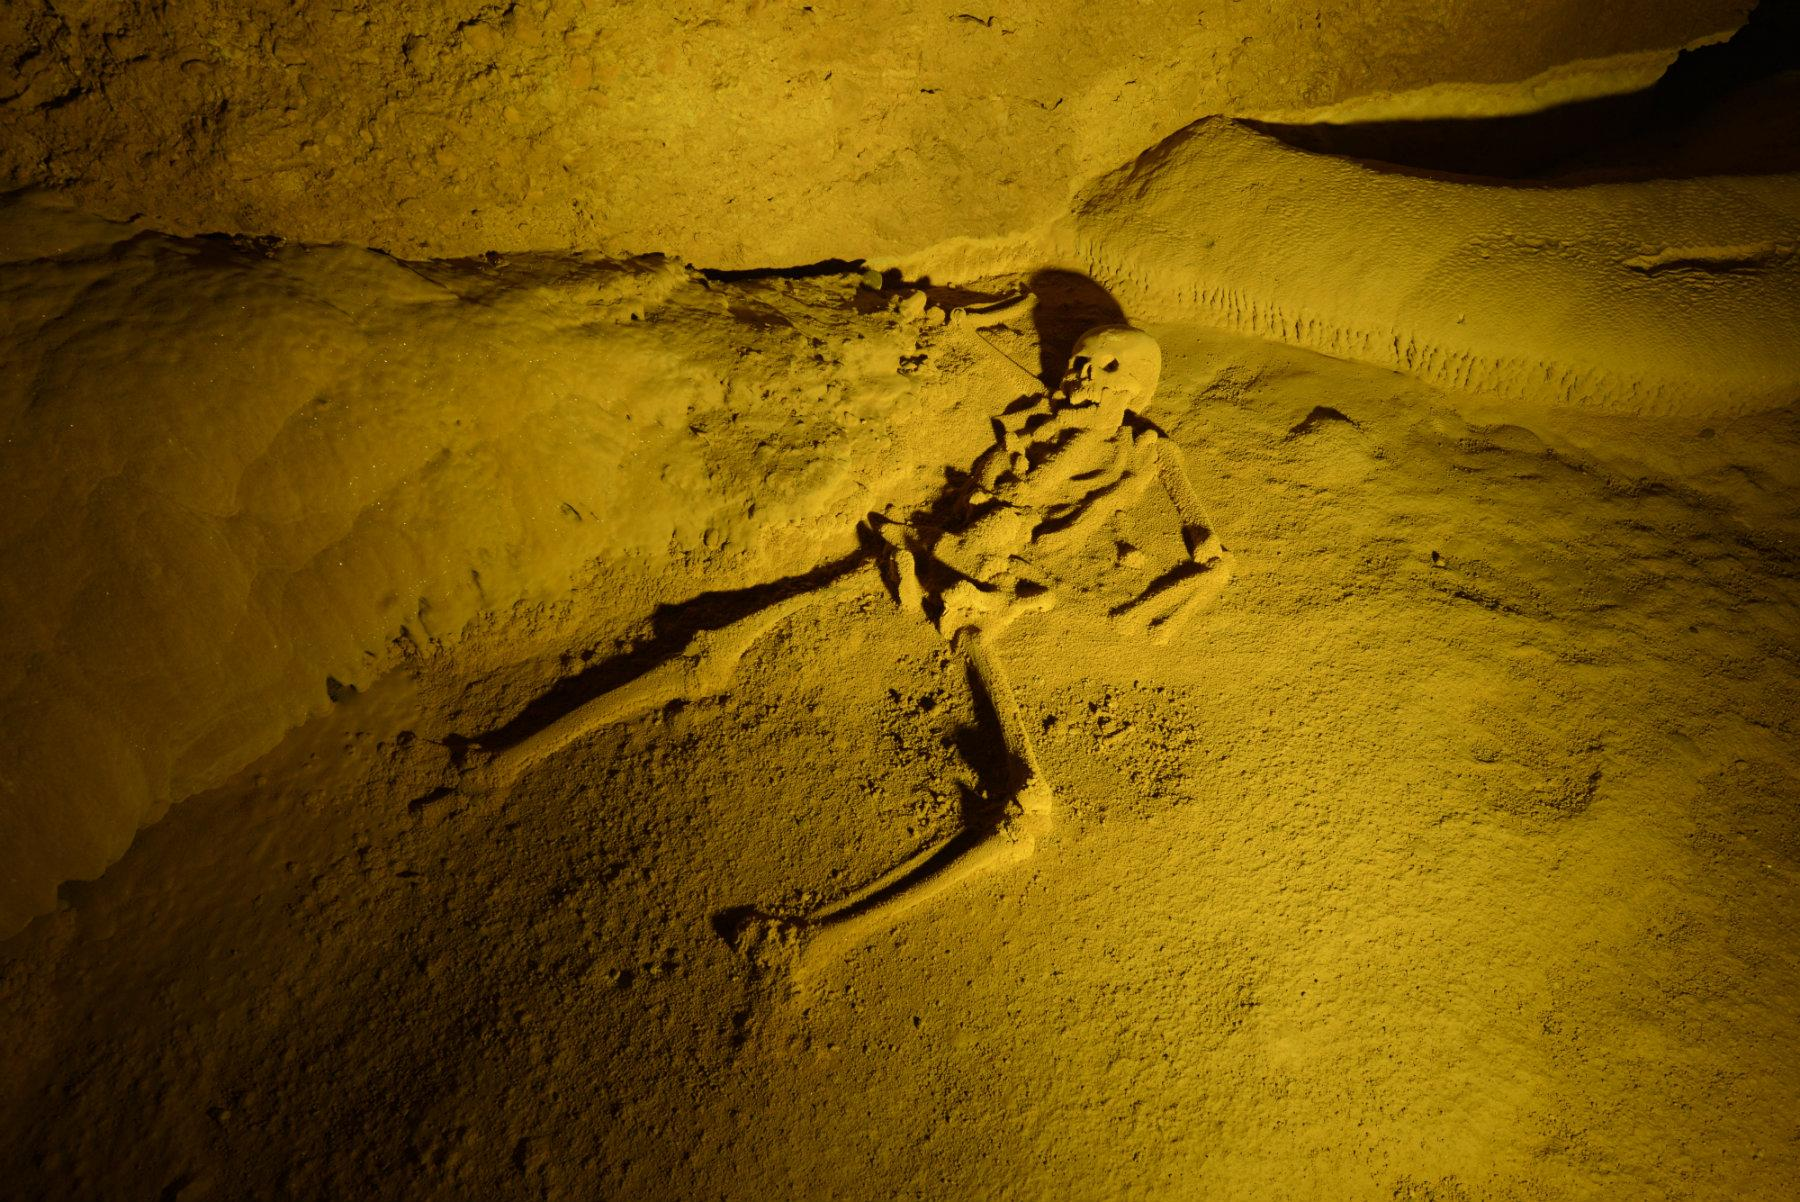 Actun-Tunichil-Muknal-Cave-Belizes-Ancient-Gateway-to-the-Underworld-06